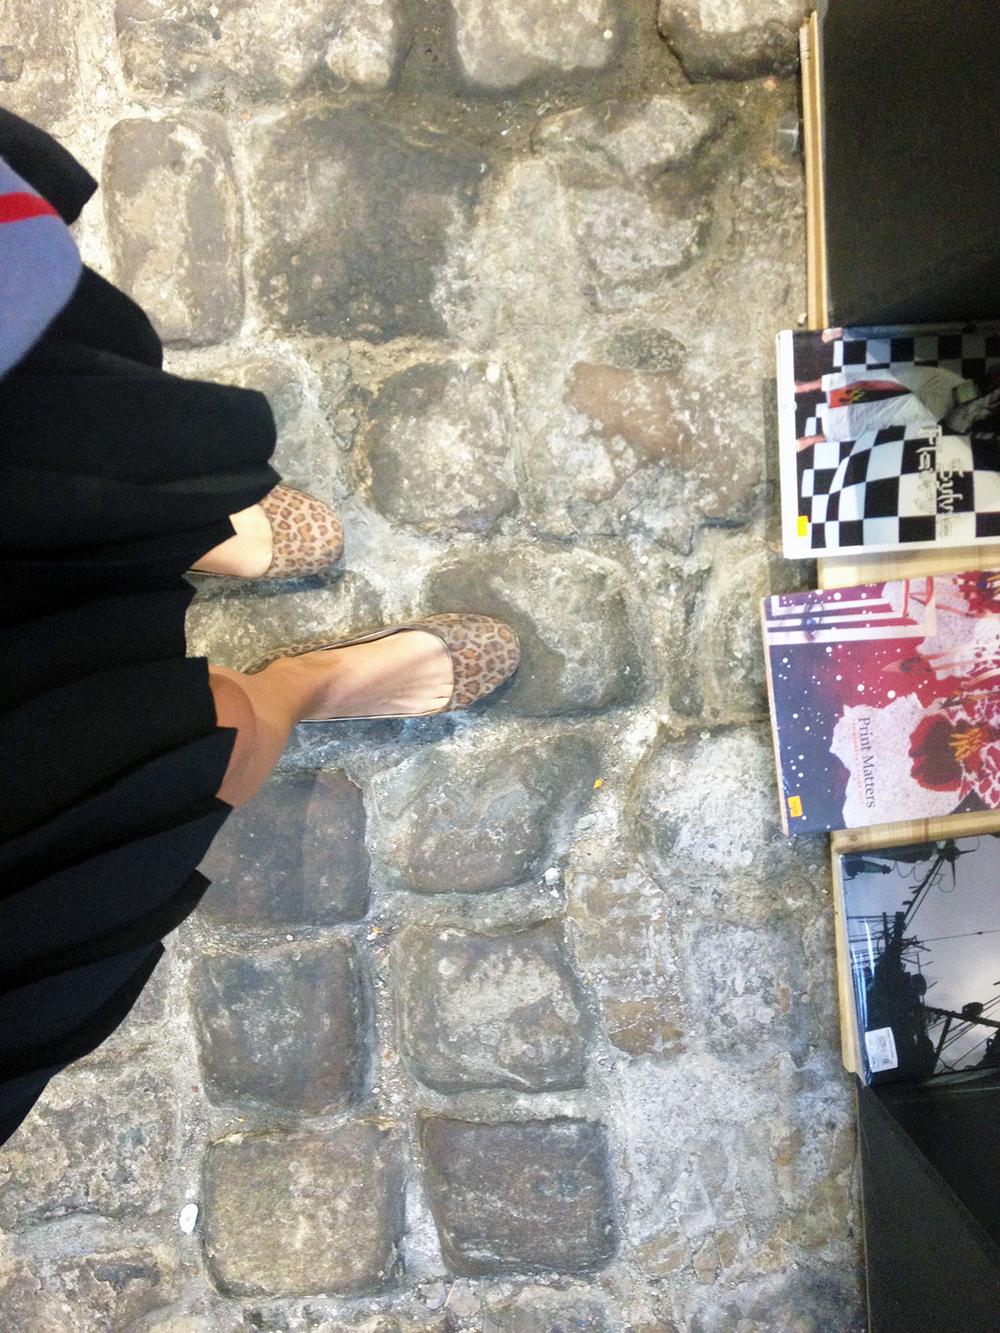 Bookshop in Paris / Second Floor Flat